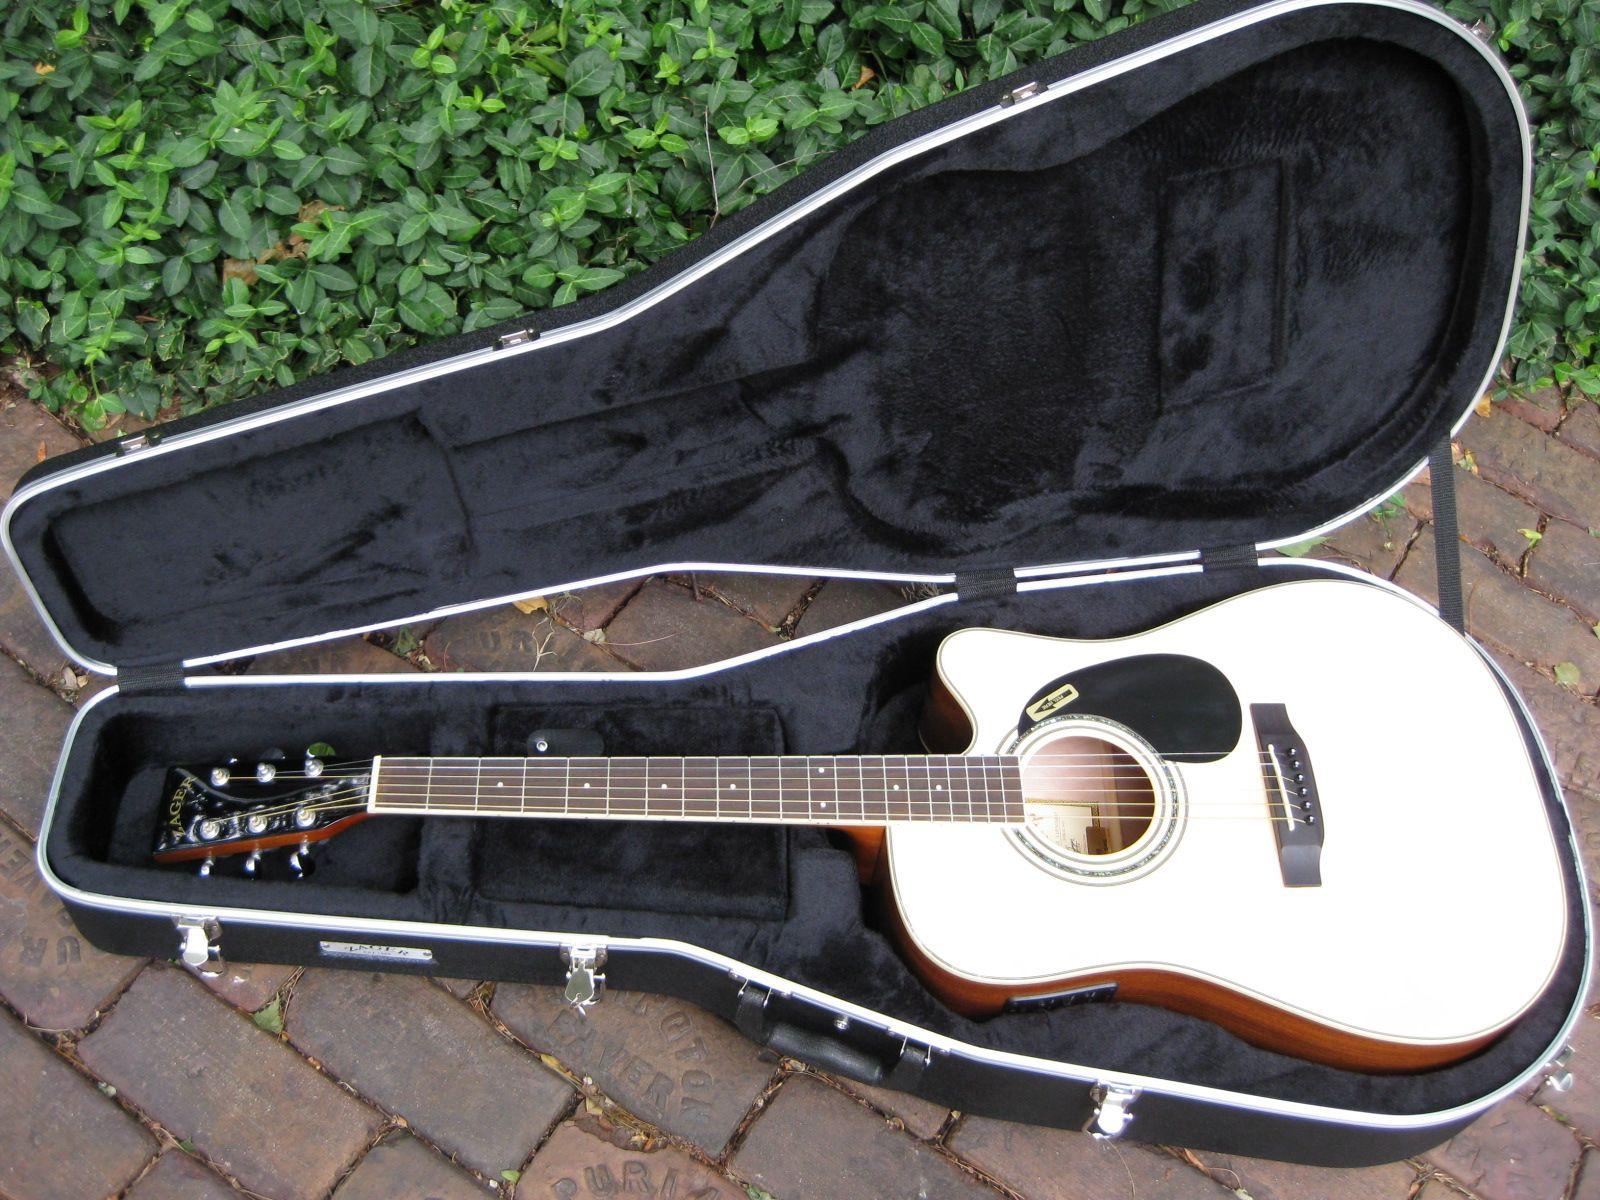 Zager Guitars Zager Reviews Guitar Guitar Reviews Acoustic